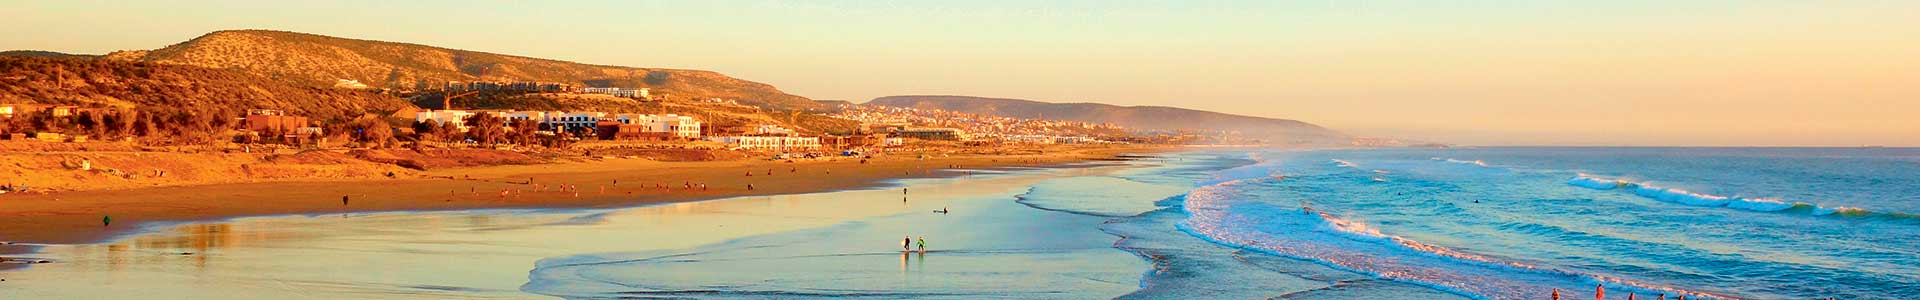 Voyage Agadir - TUI